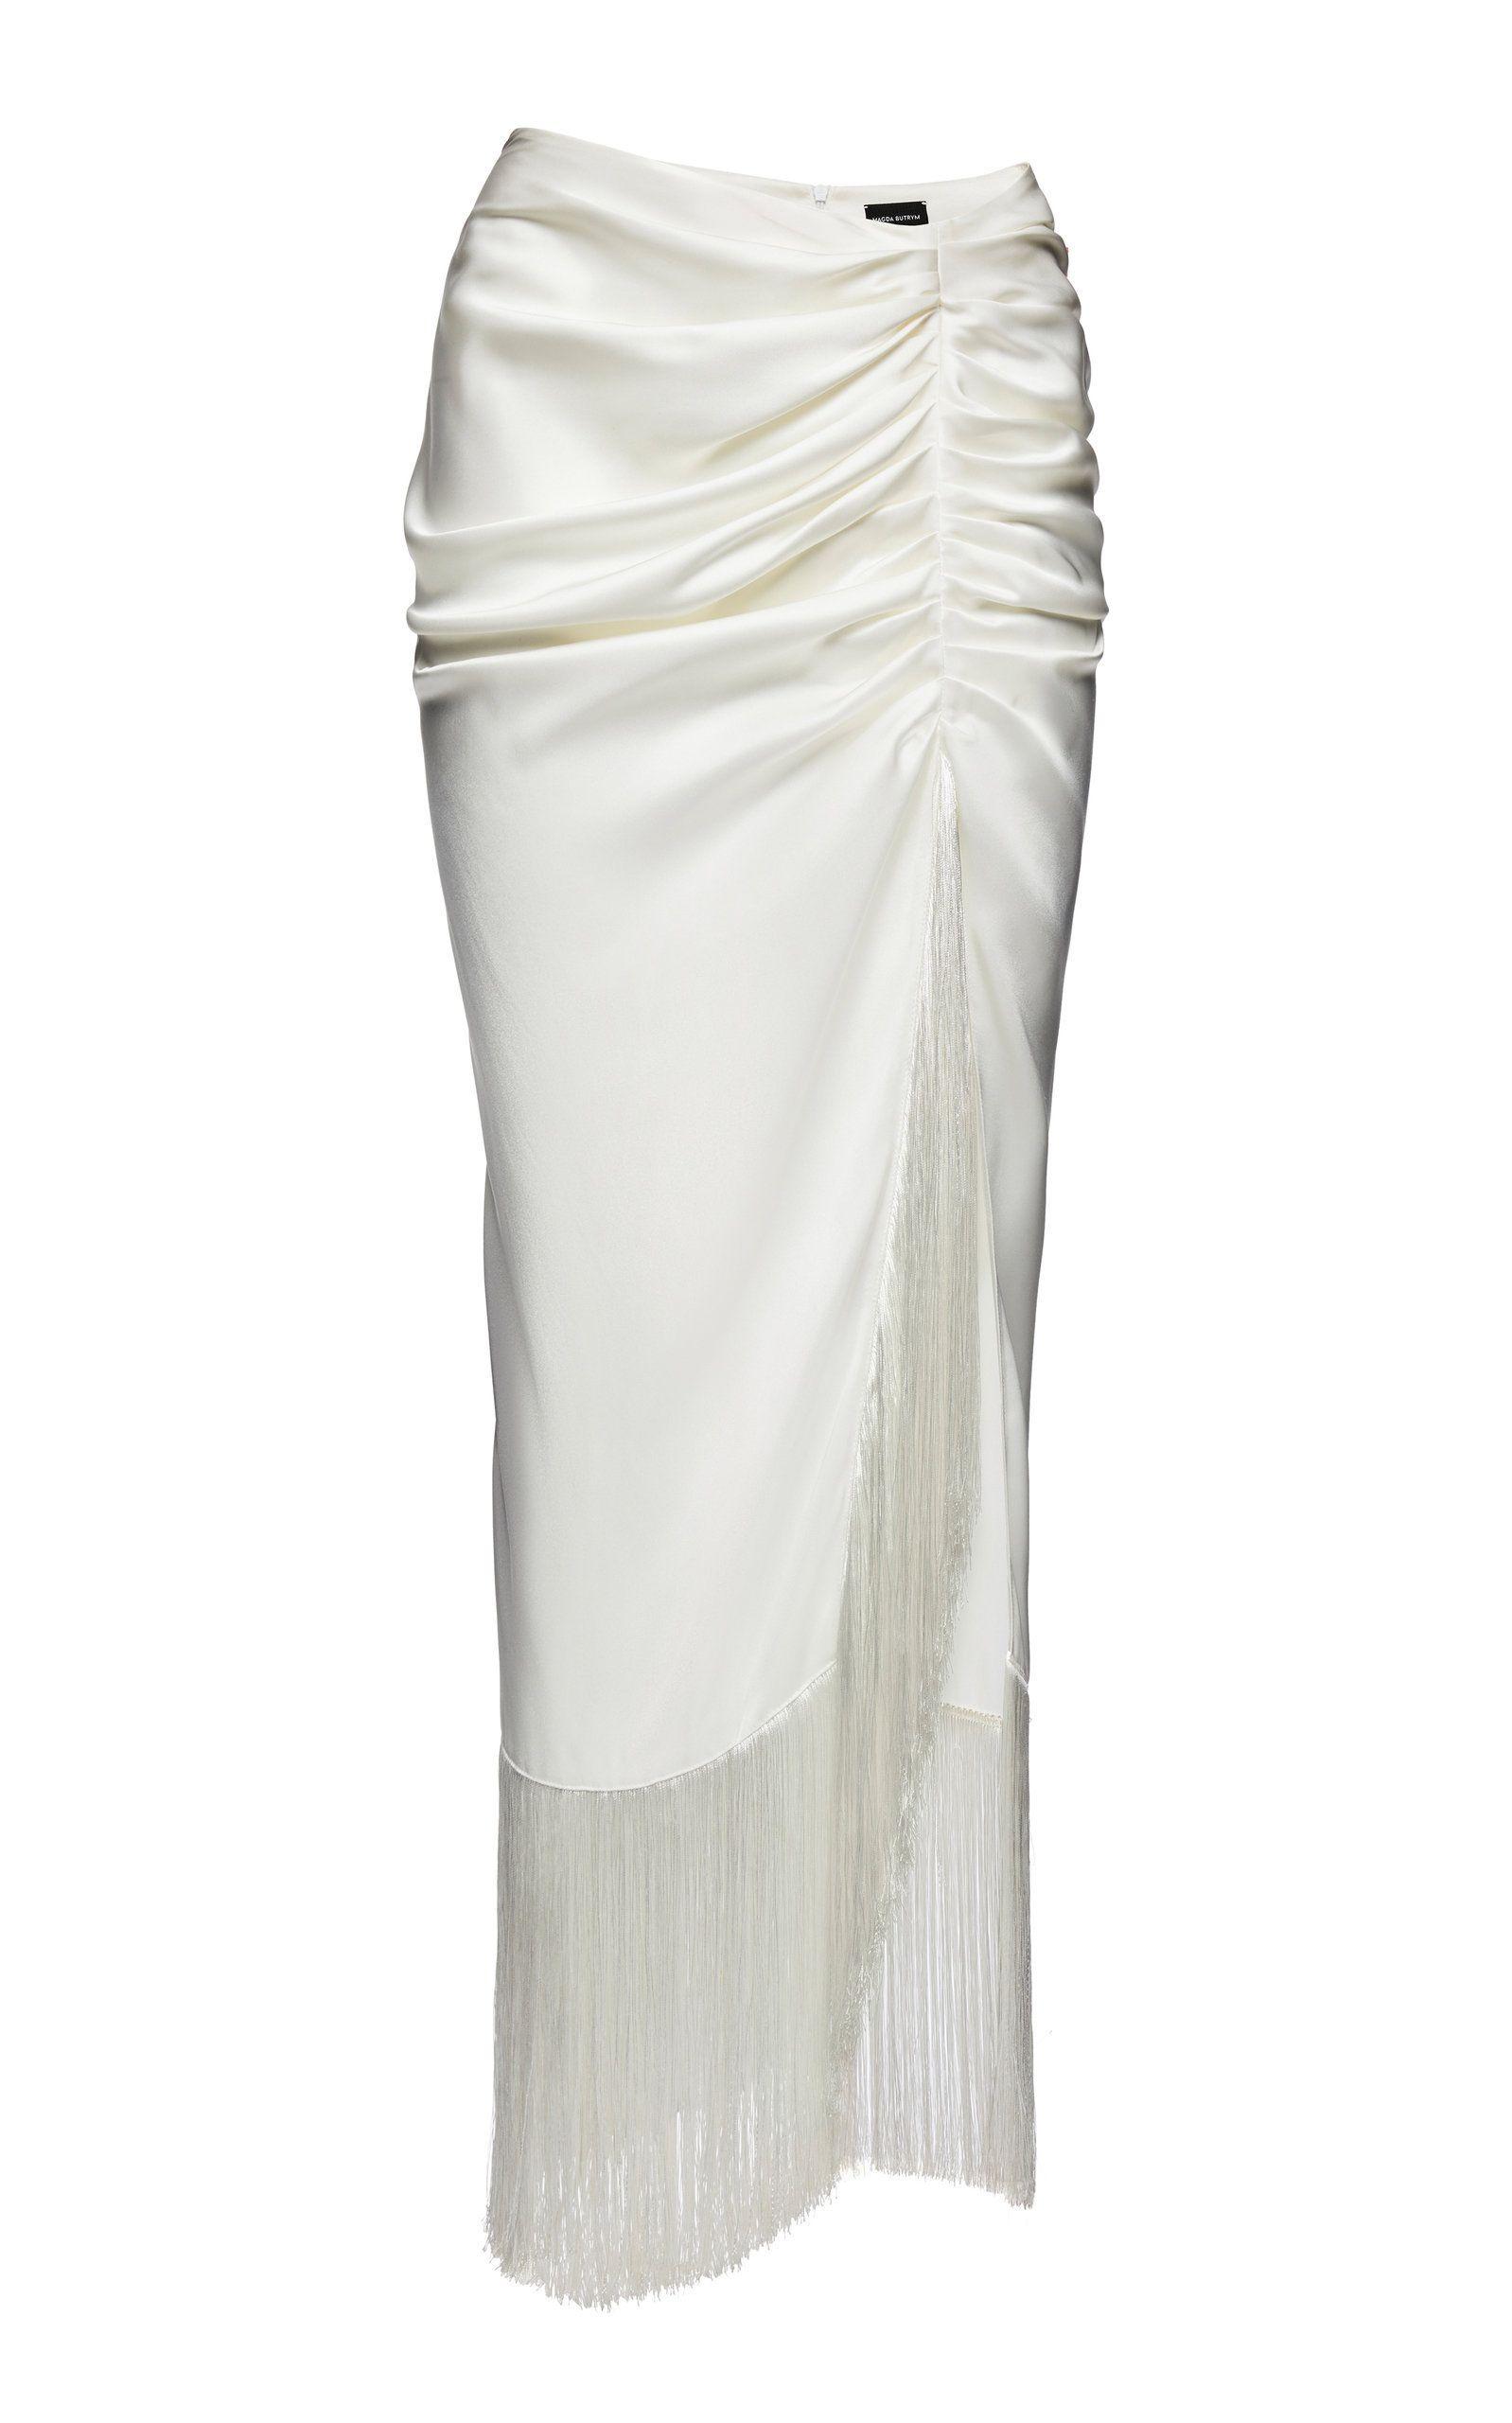 13de756a9395 Alba Ruched Silk Maxi Skirt in 2019 | Skirts & Dresses | Maxi skirt ...